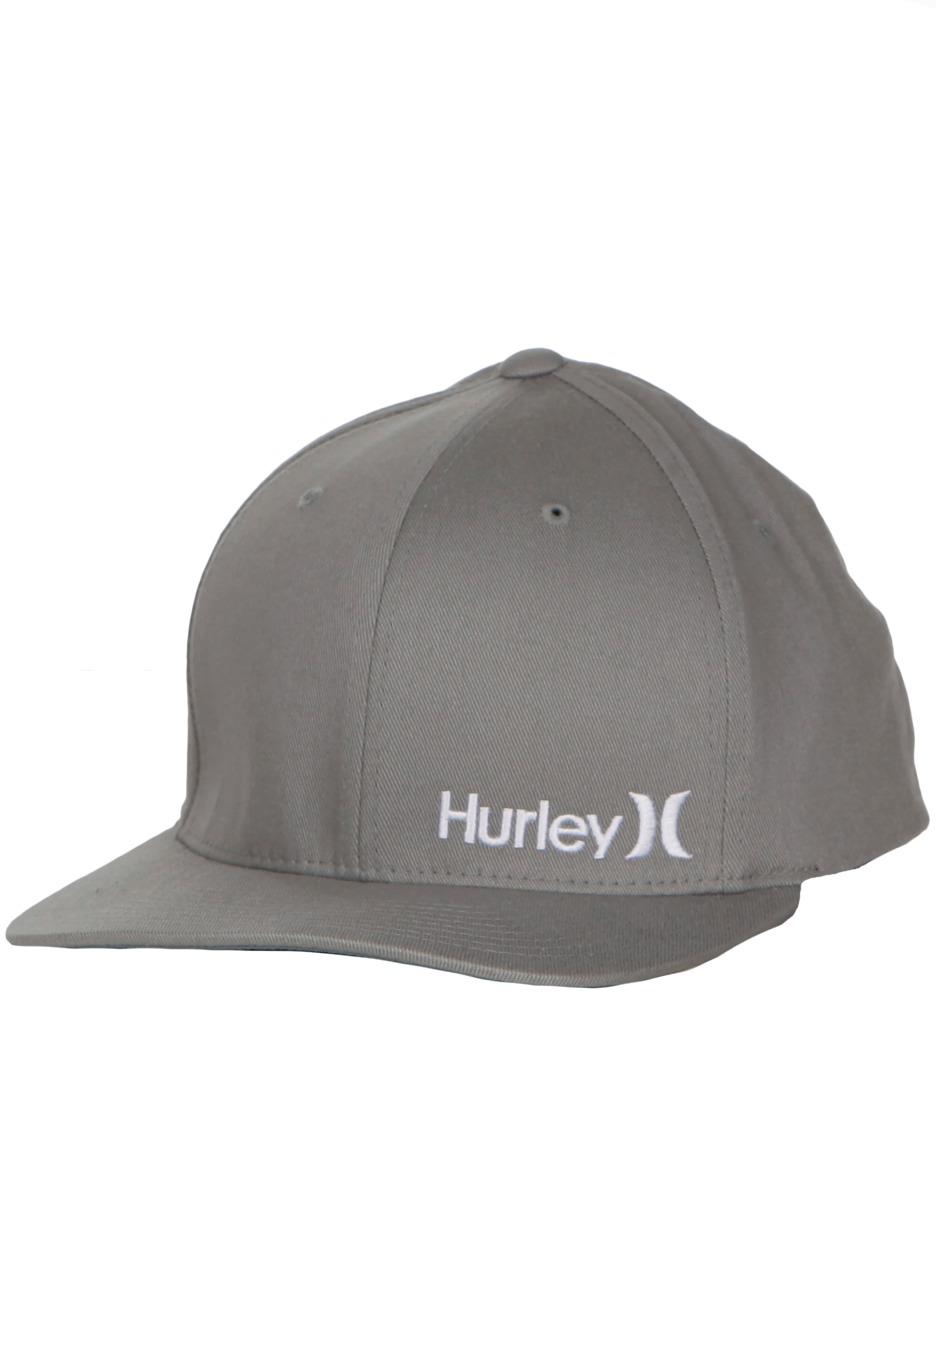 Hurley - Corp Graphite Flexfit - Cap - Impericon.com Worldwide 1426b1c040f